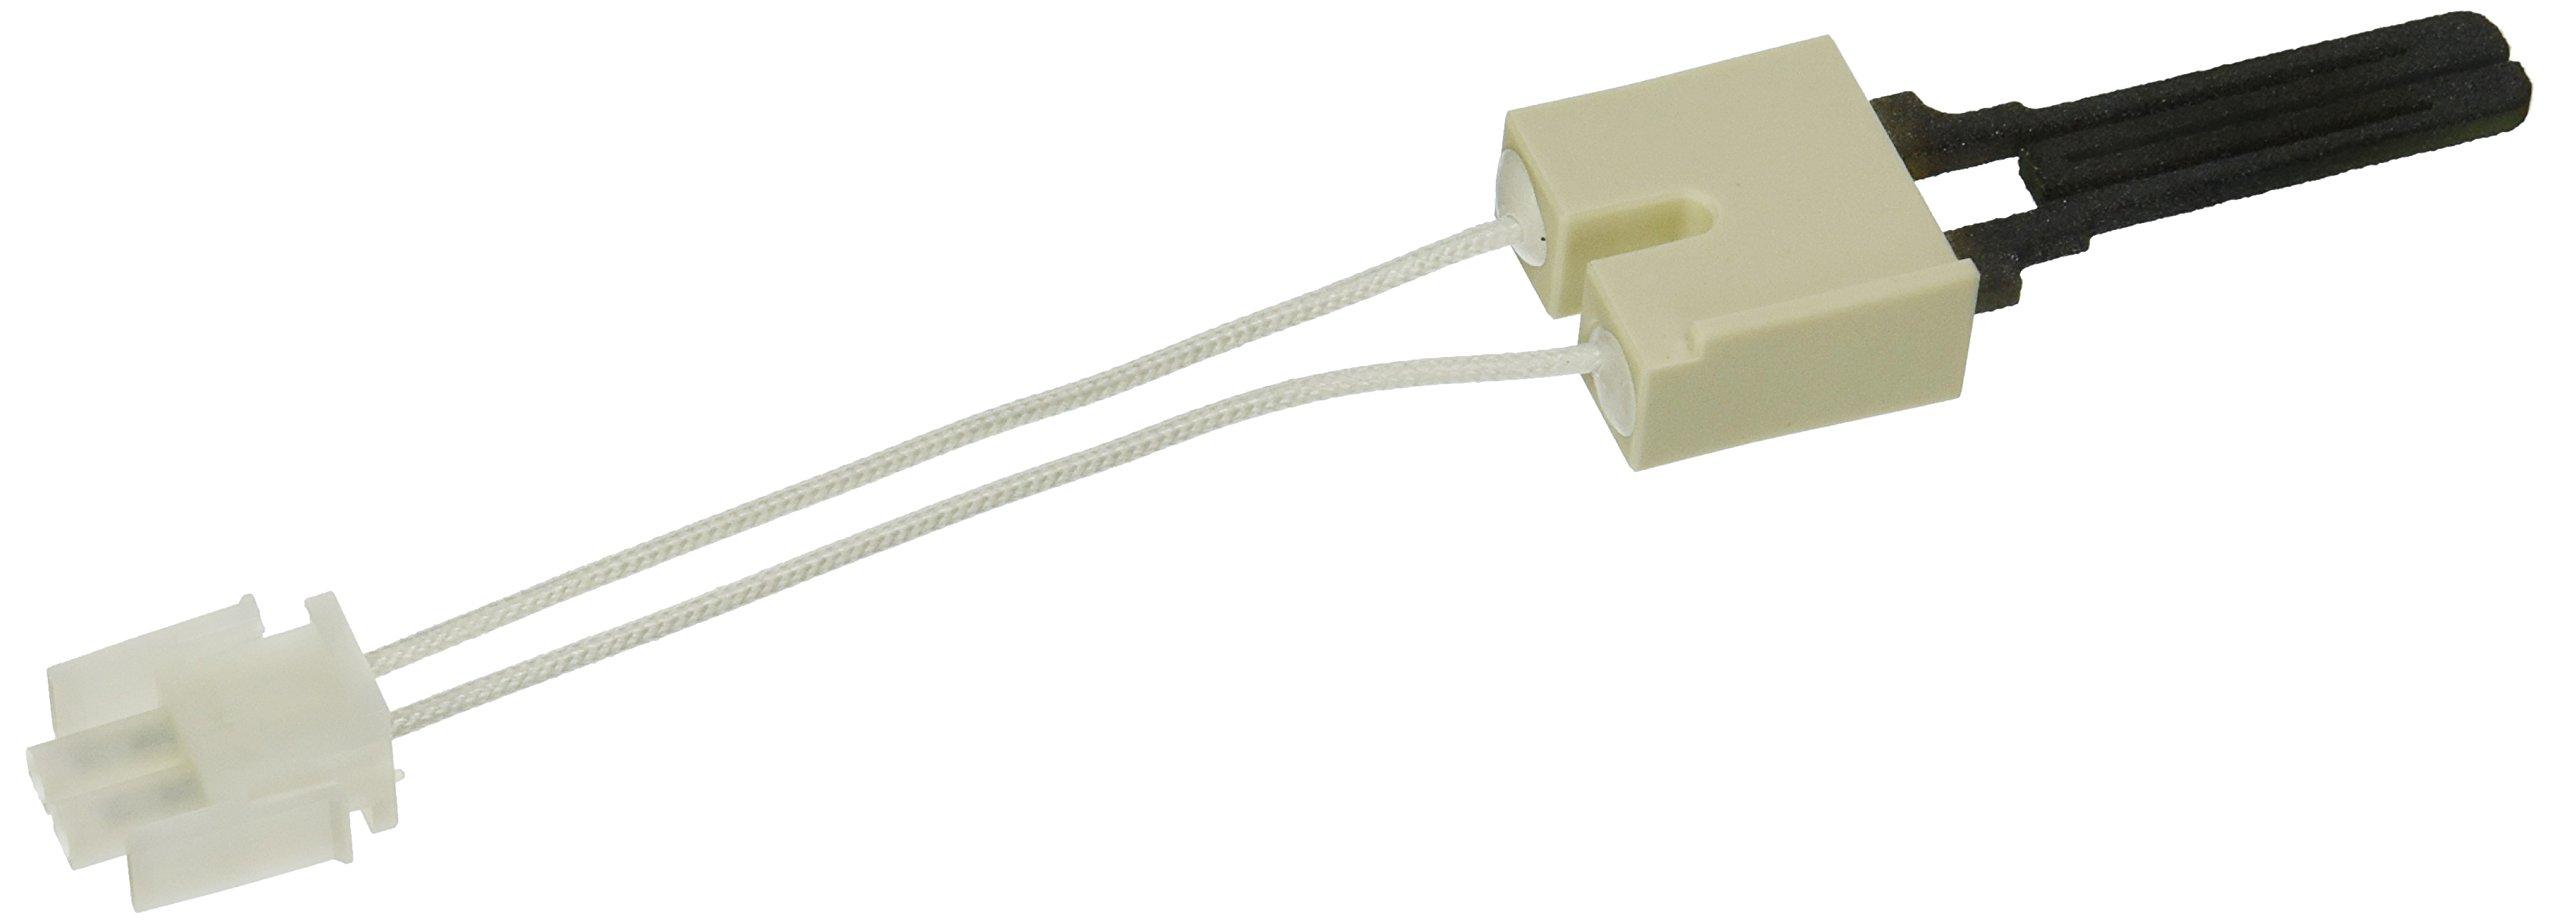 Robertshaw 41-408 Hot Surface Igniter